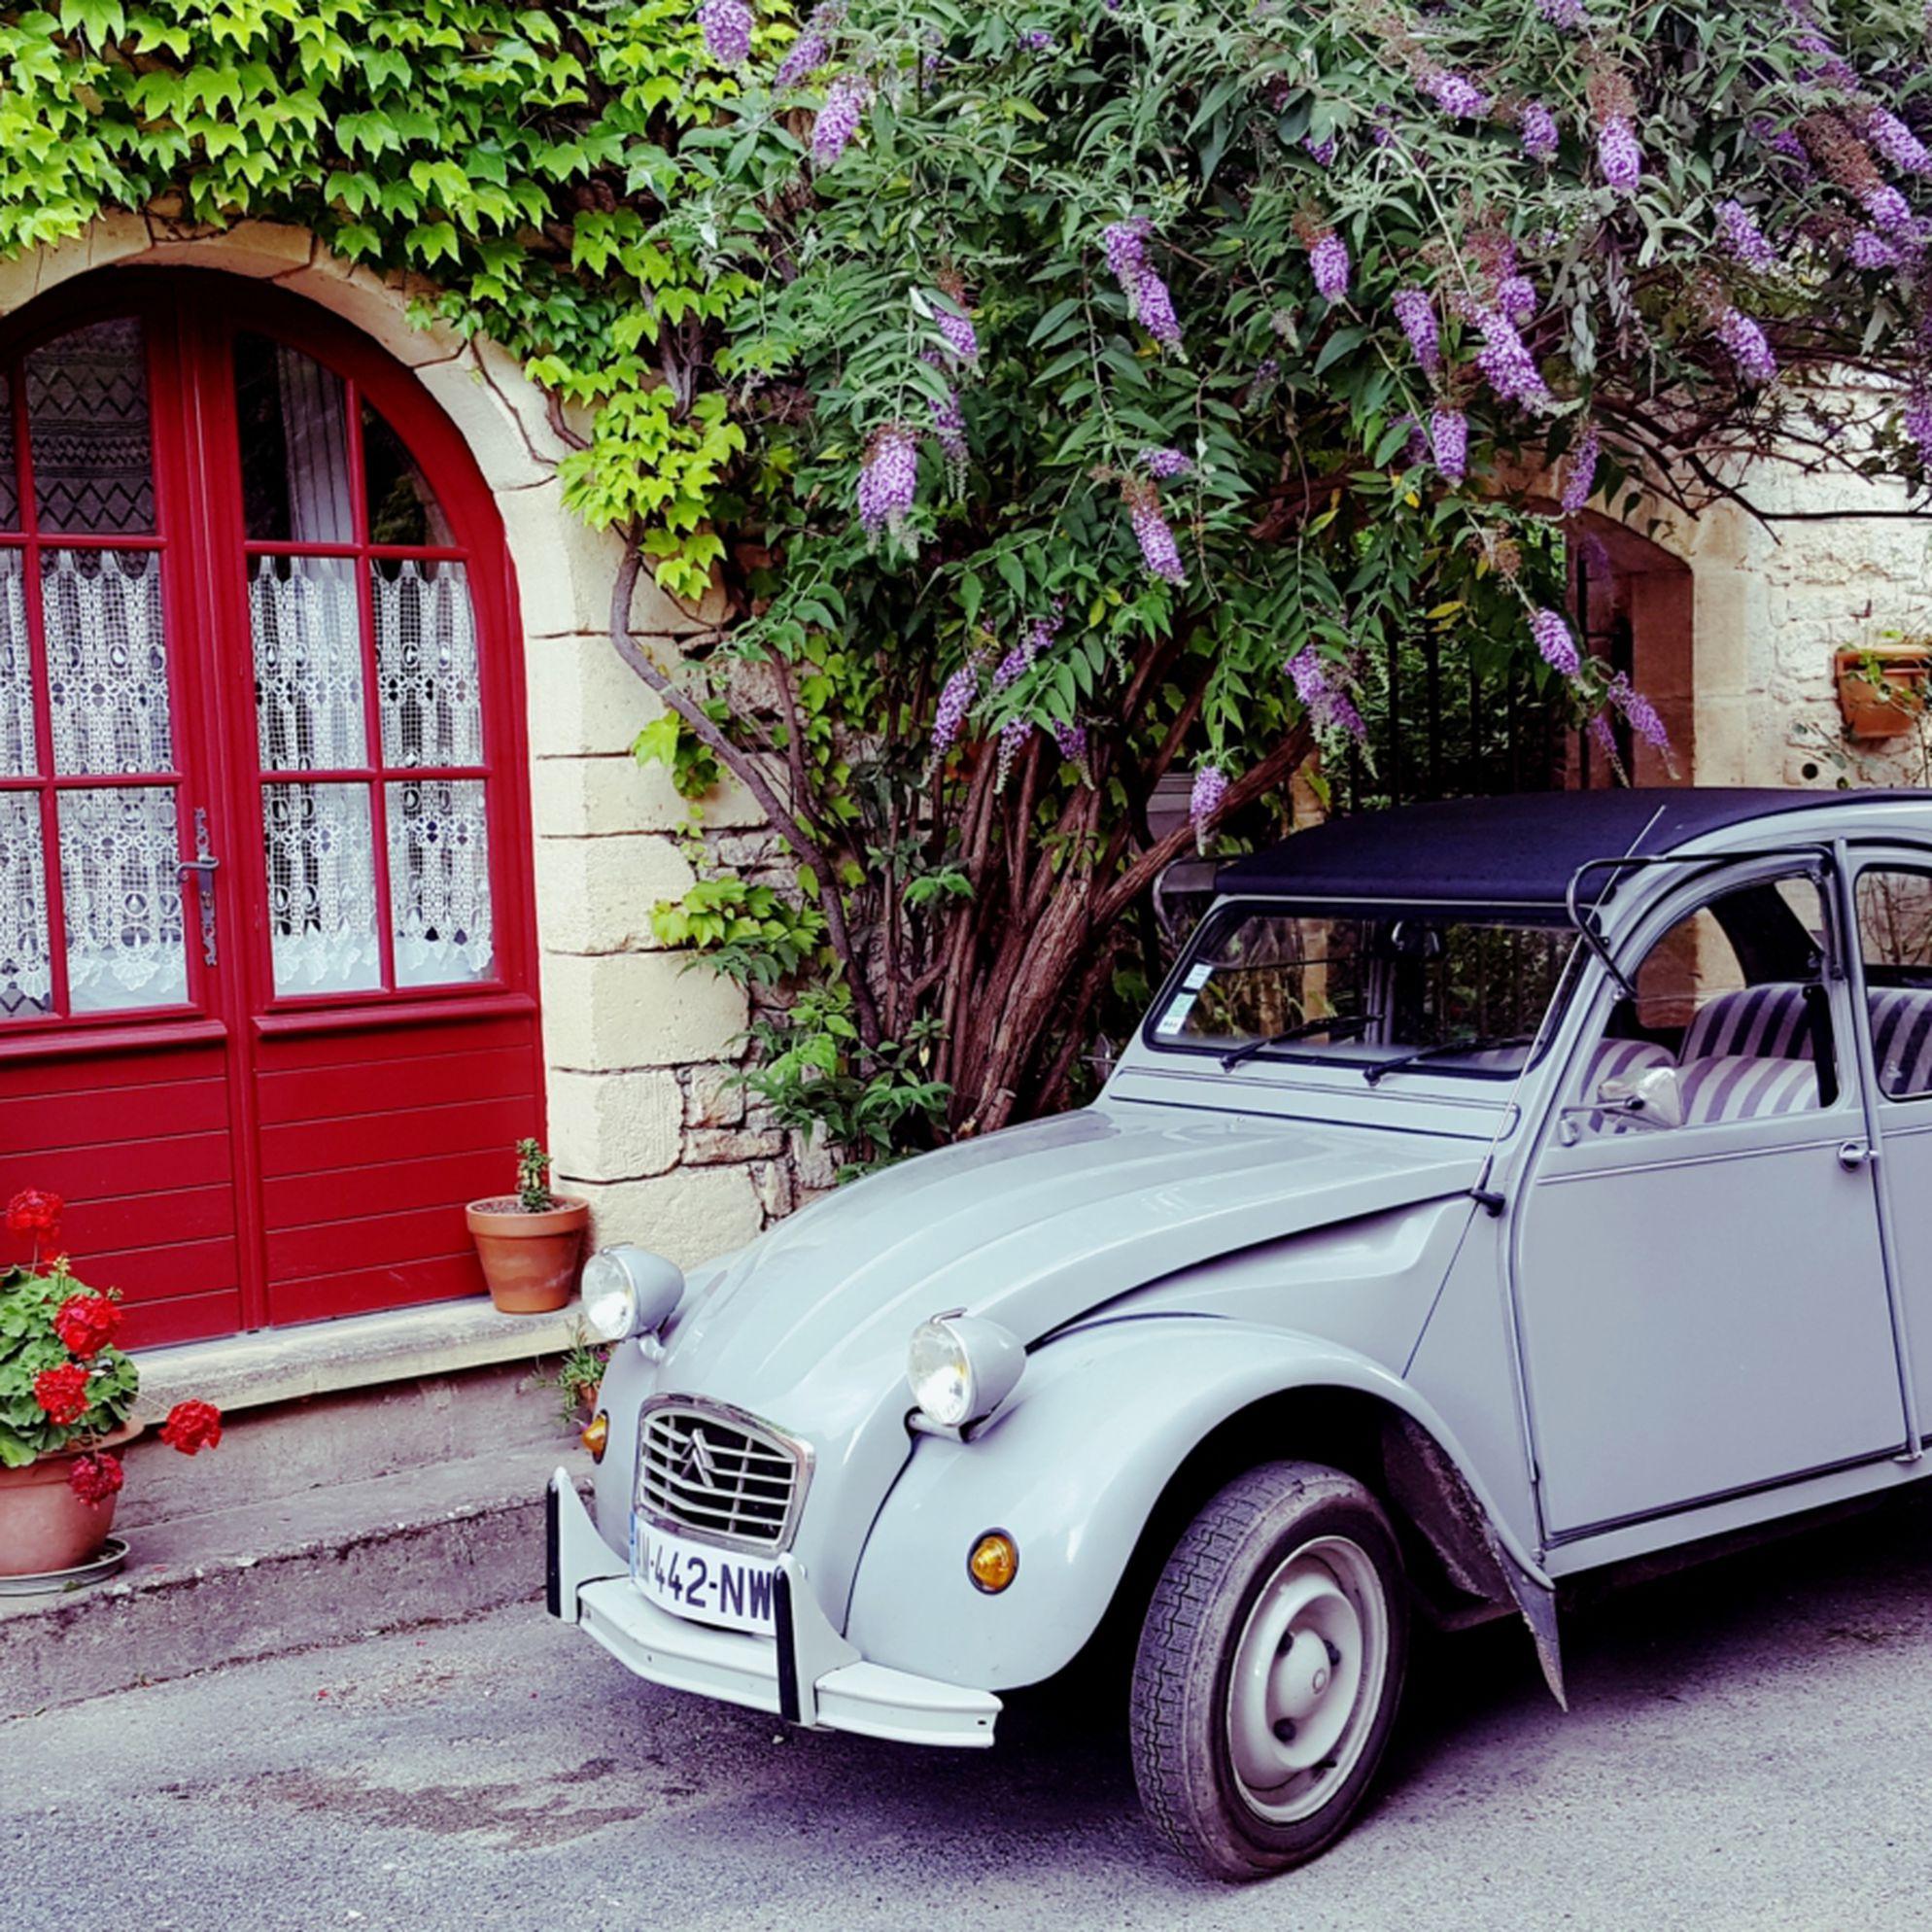 Lois Pryce's French 2CV adventure